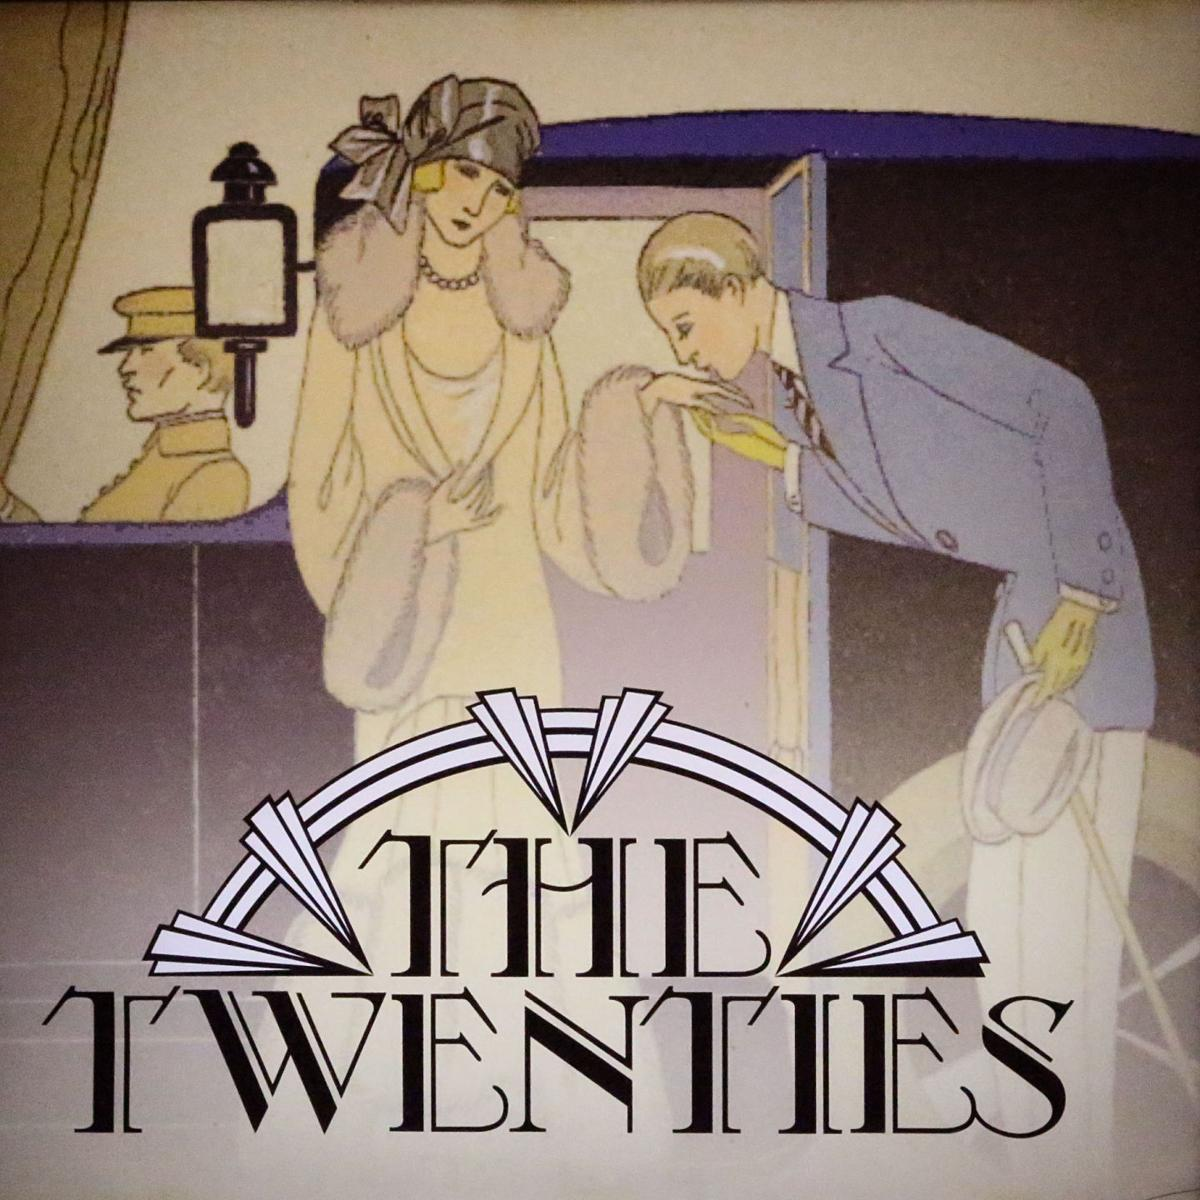 ATS Twenties at Claridge